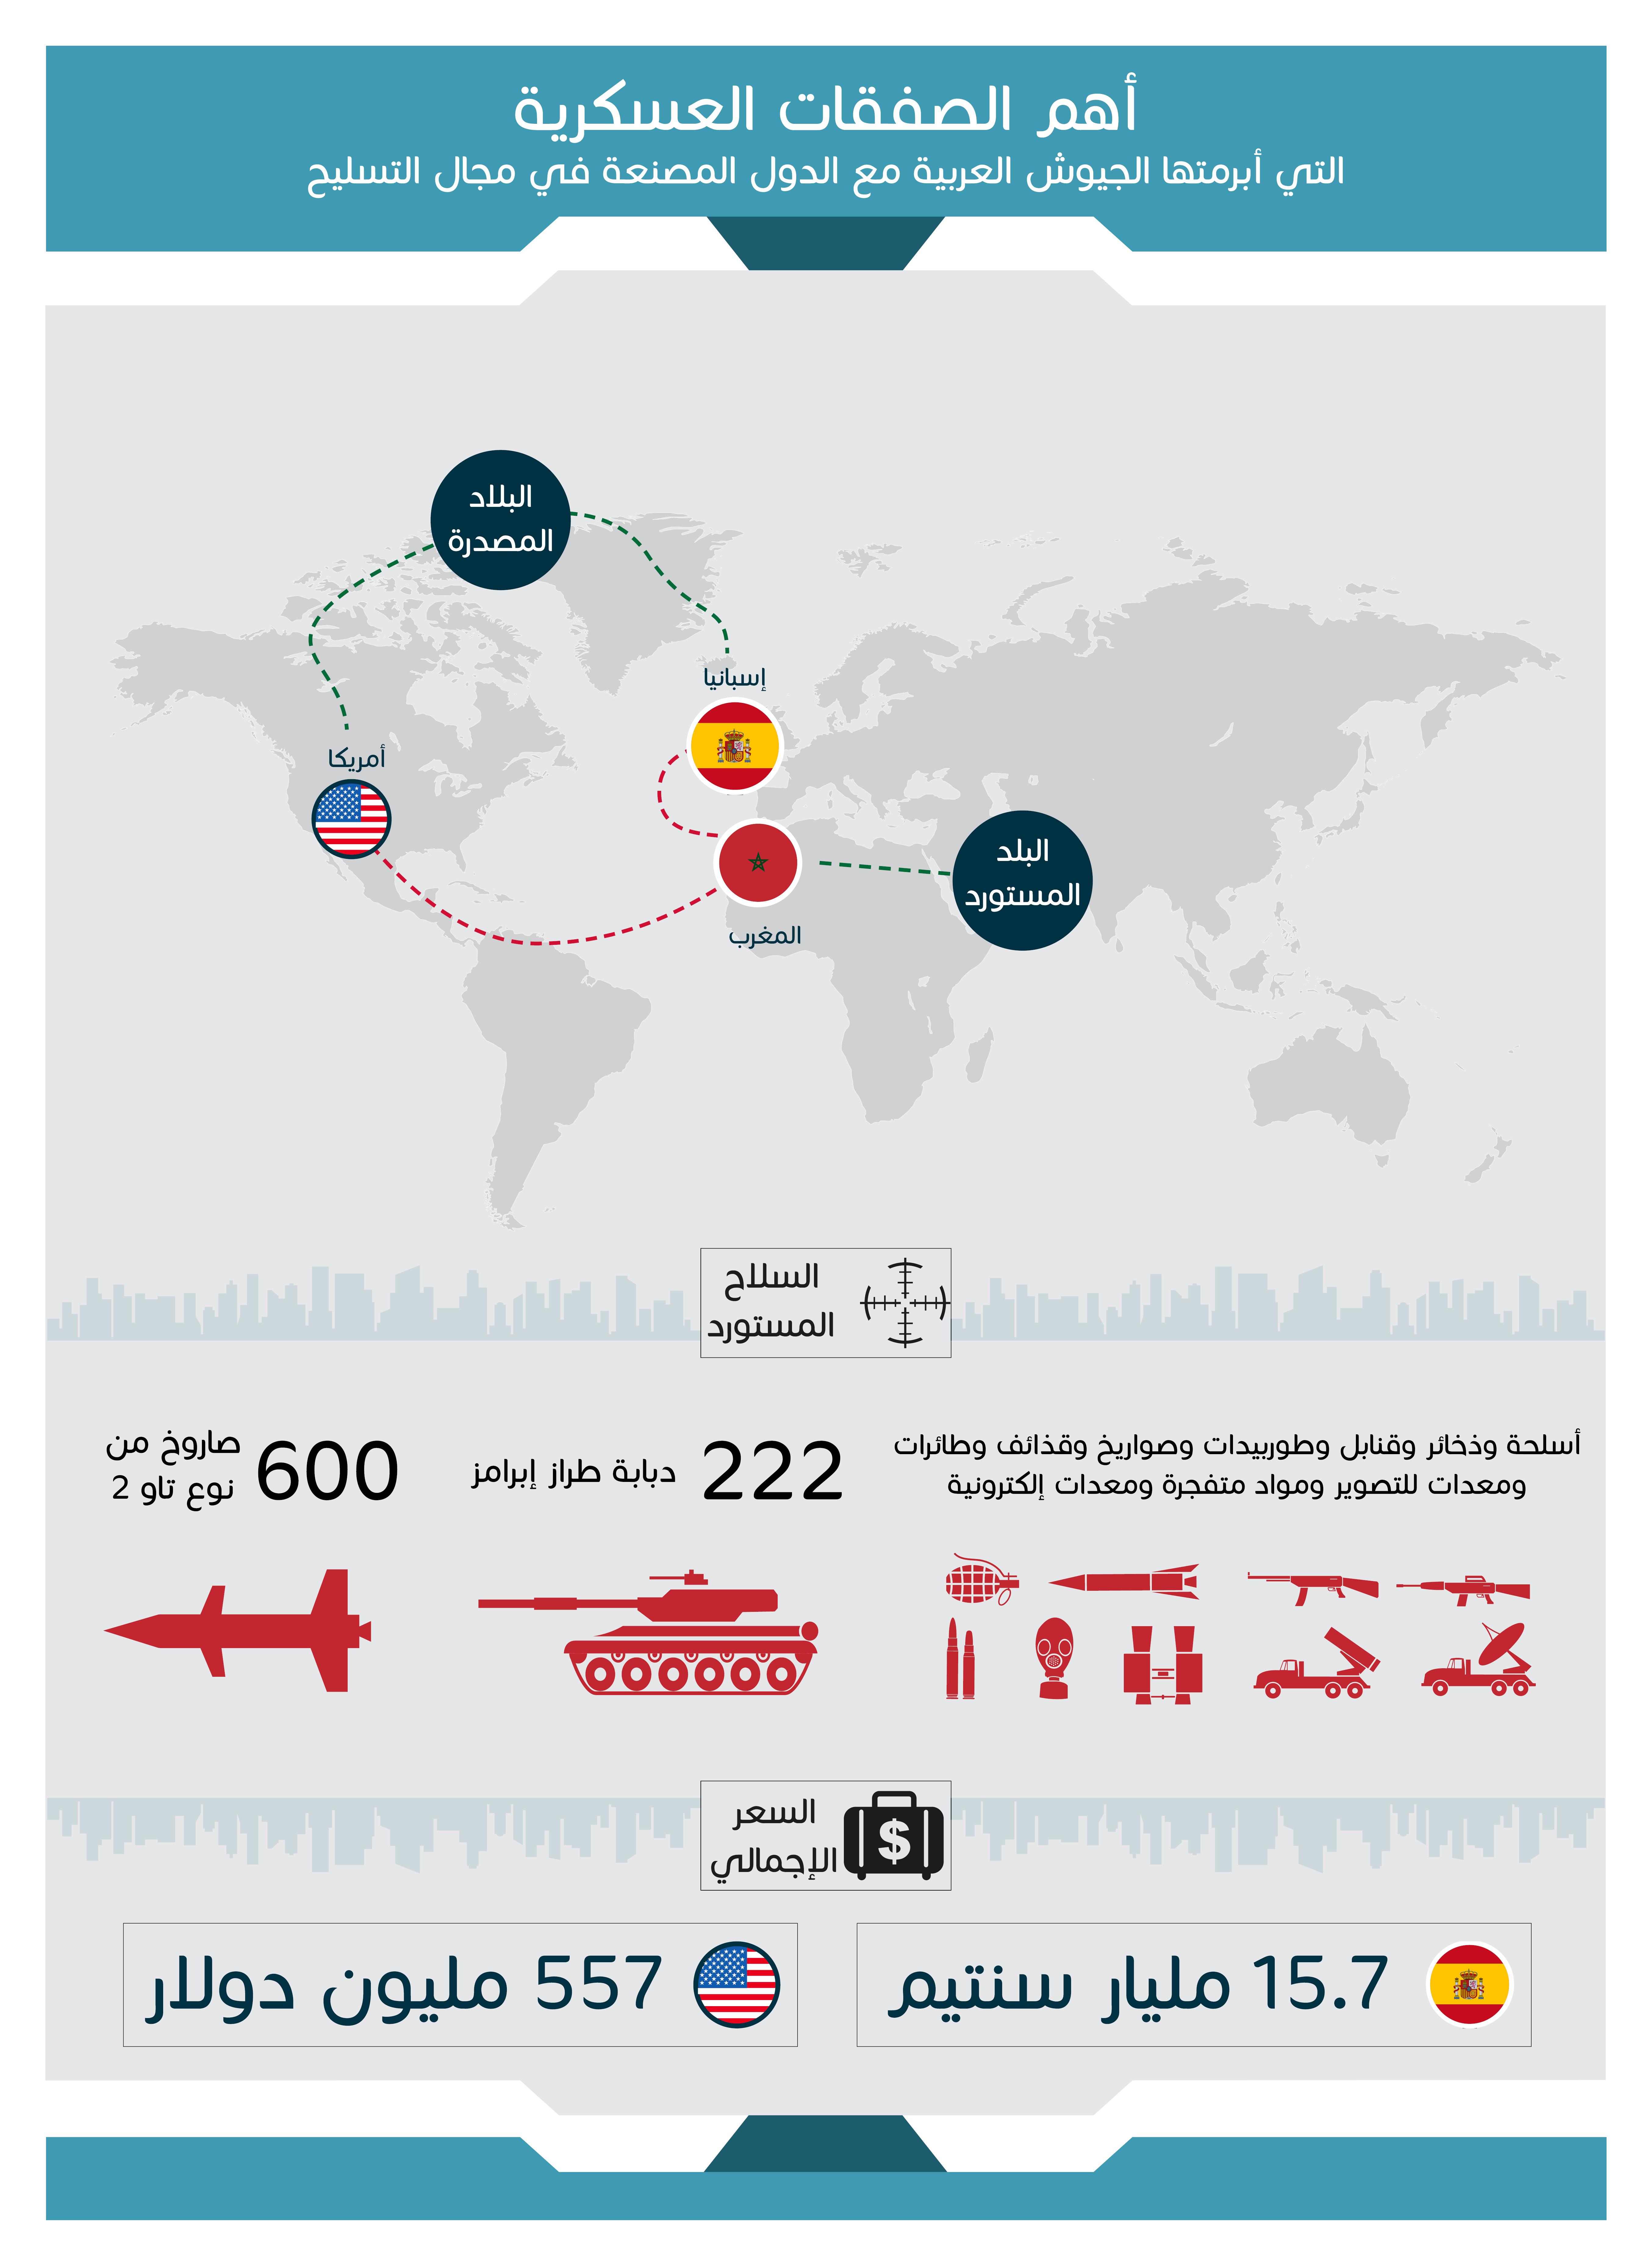 InfographicOld4